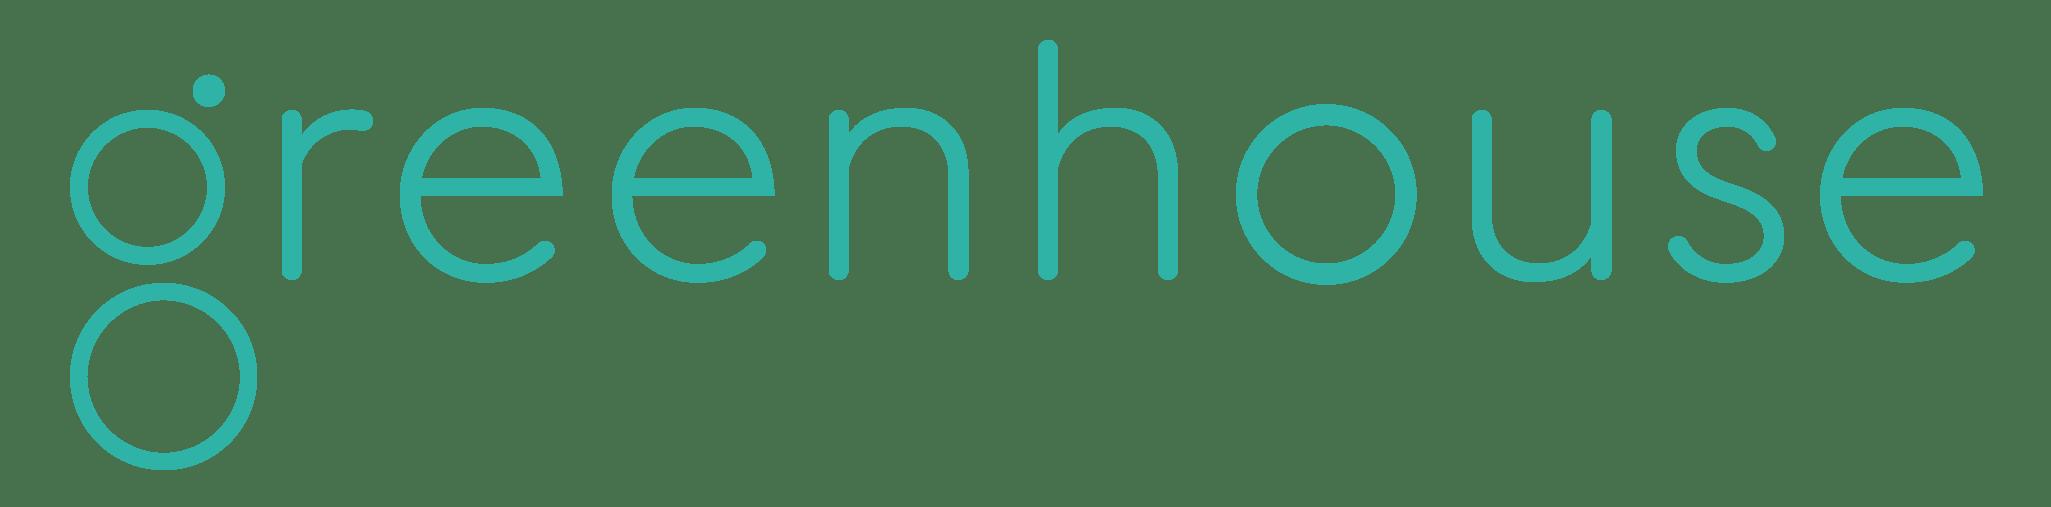 Greenhouse company logo